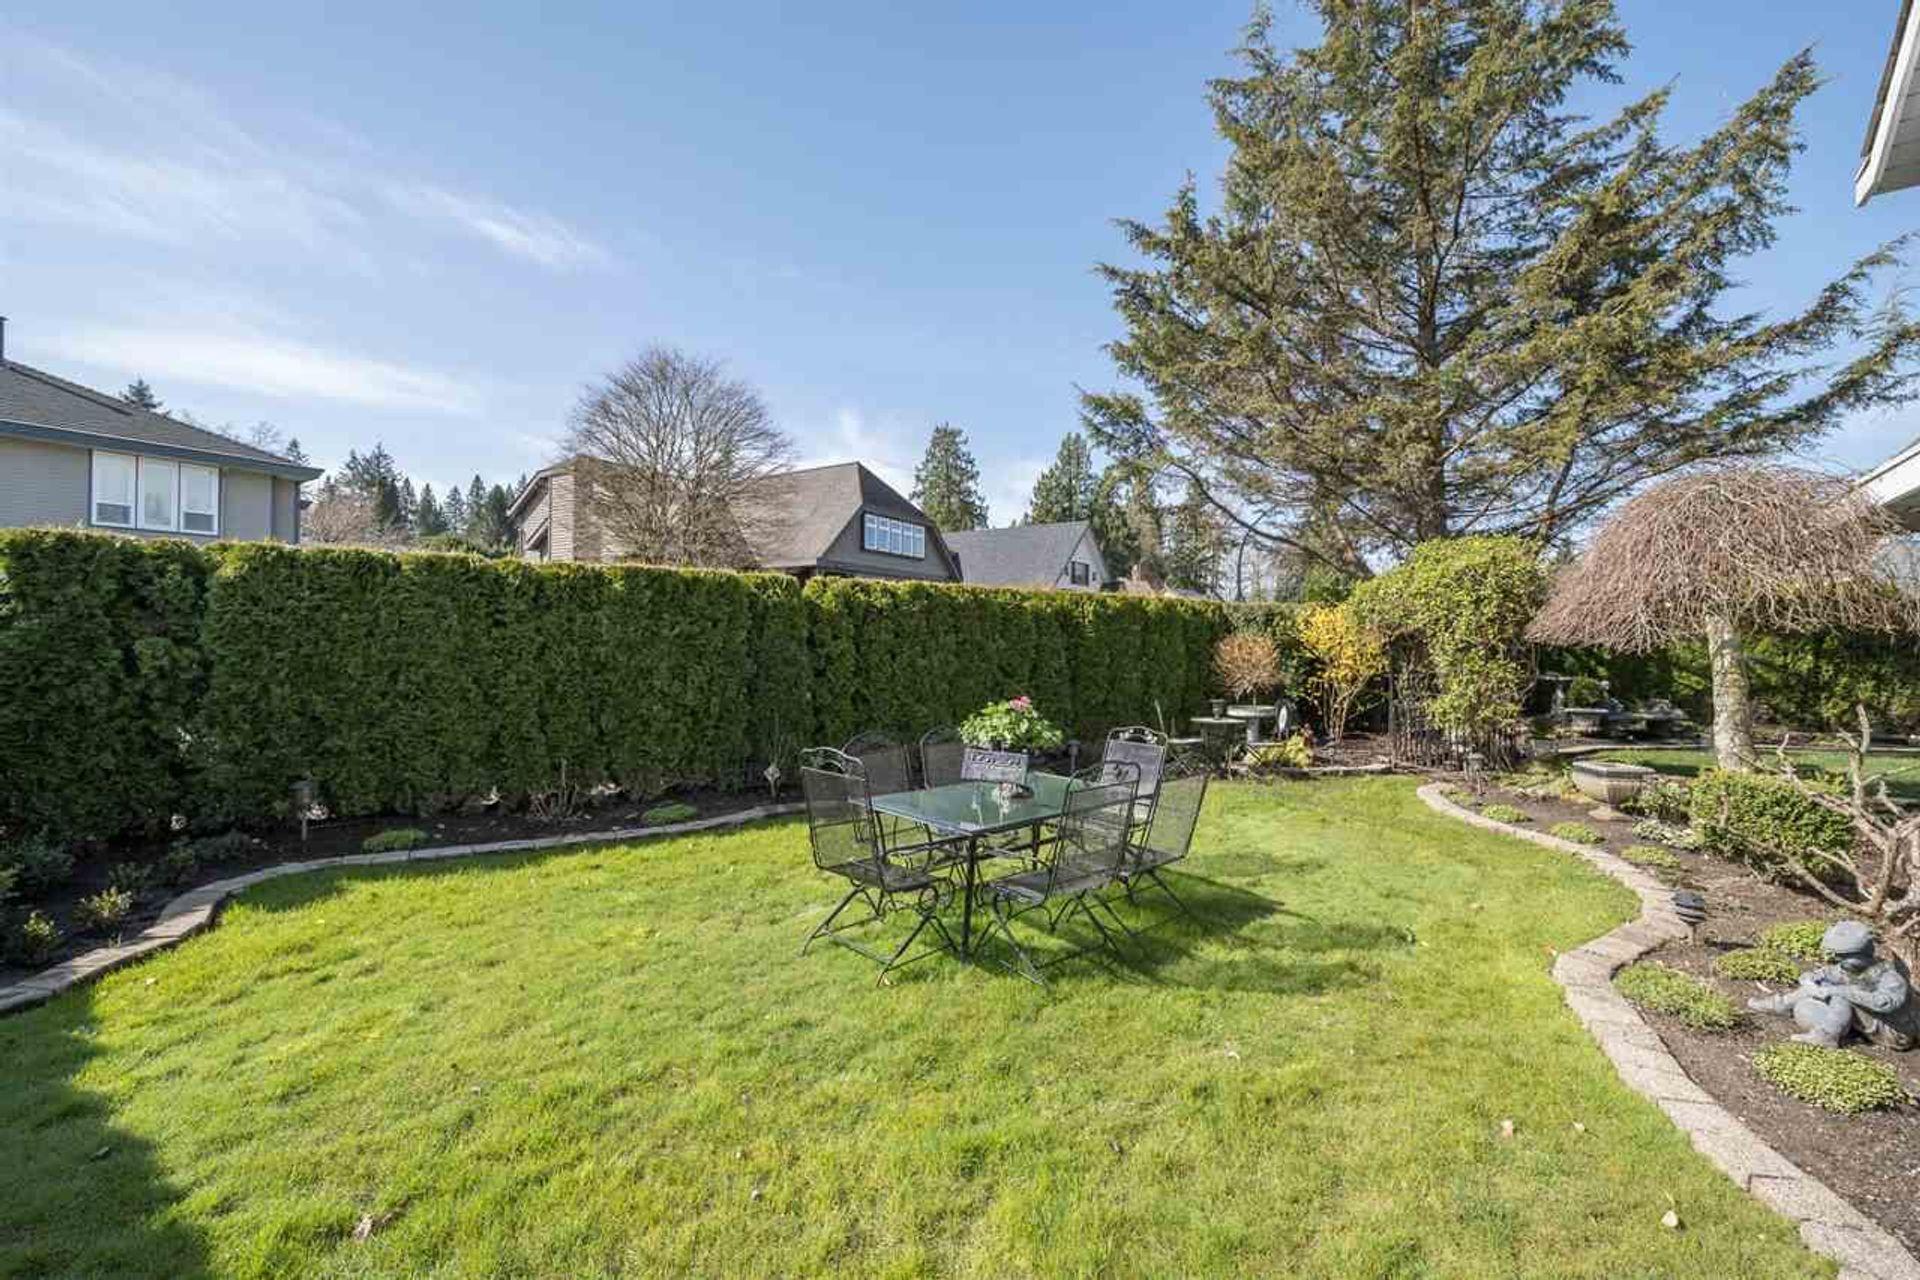 12603-215-street-west-central-maple-ridge-25 at 12603 215 Street, West Central, Maple Ridge